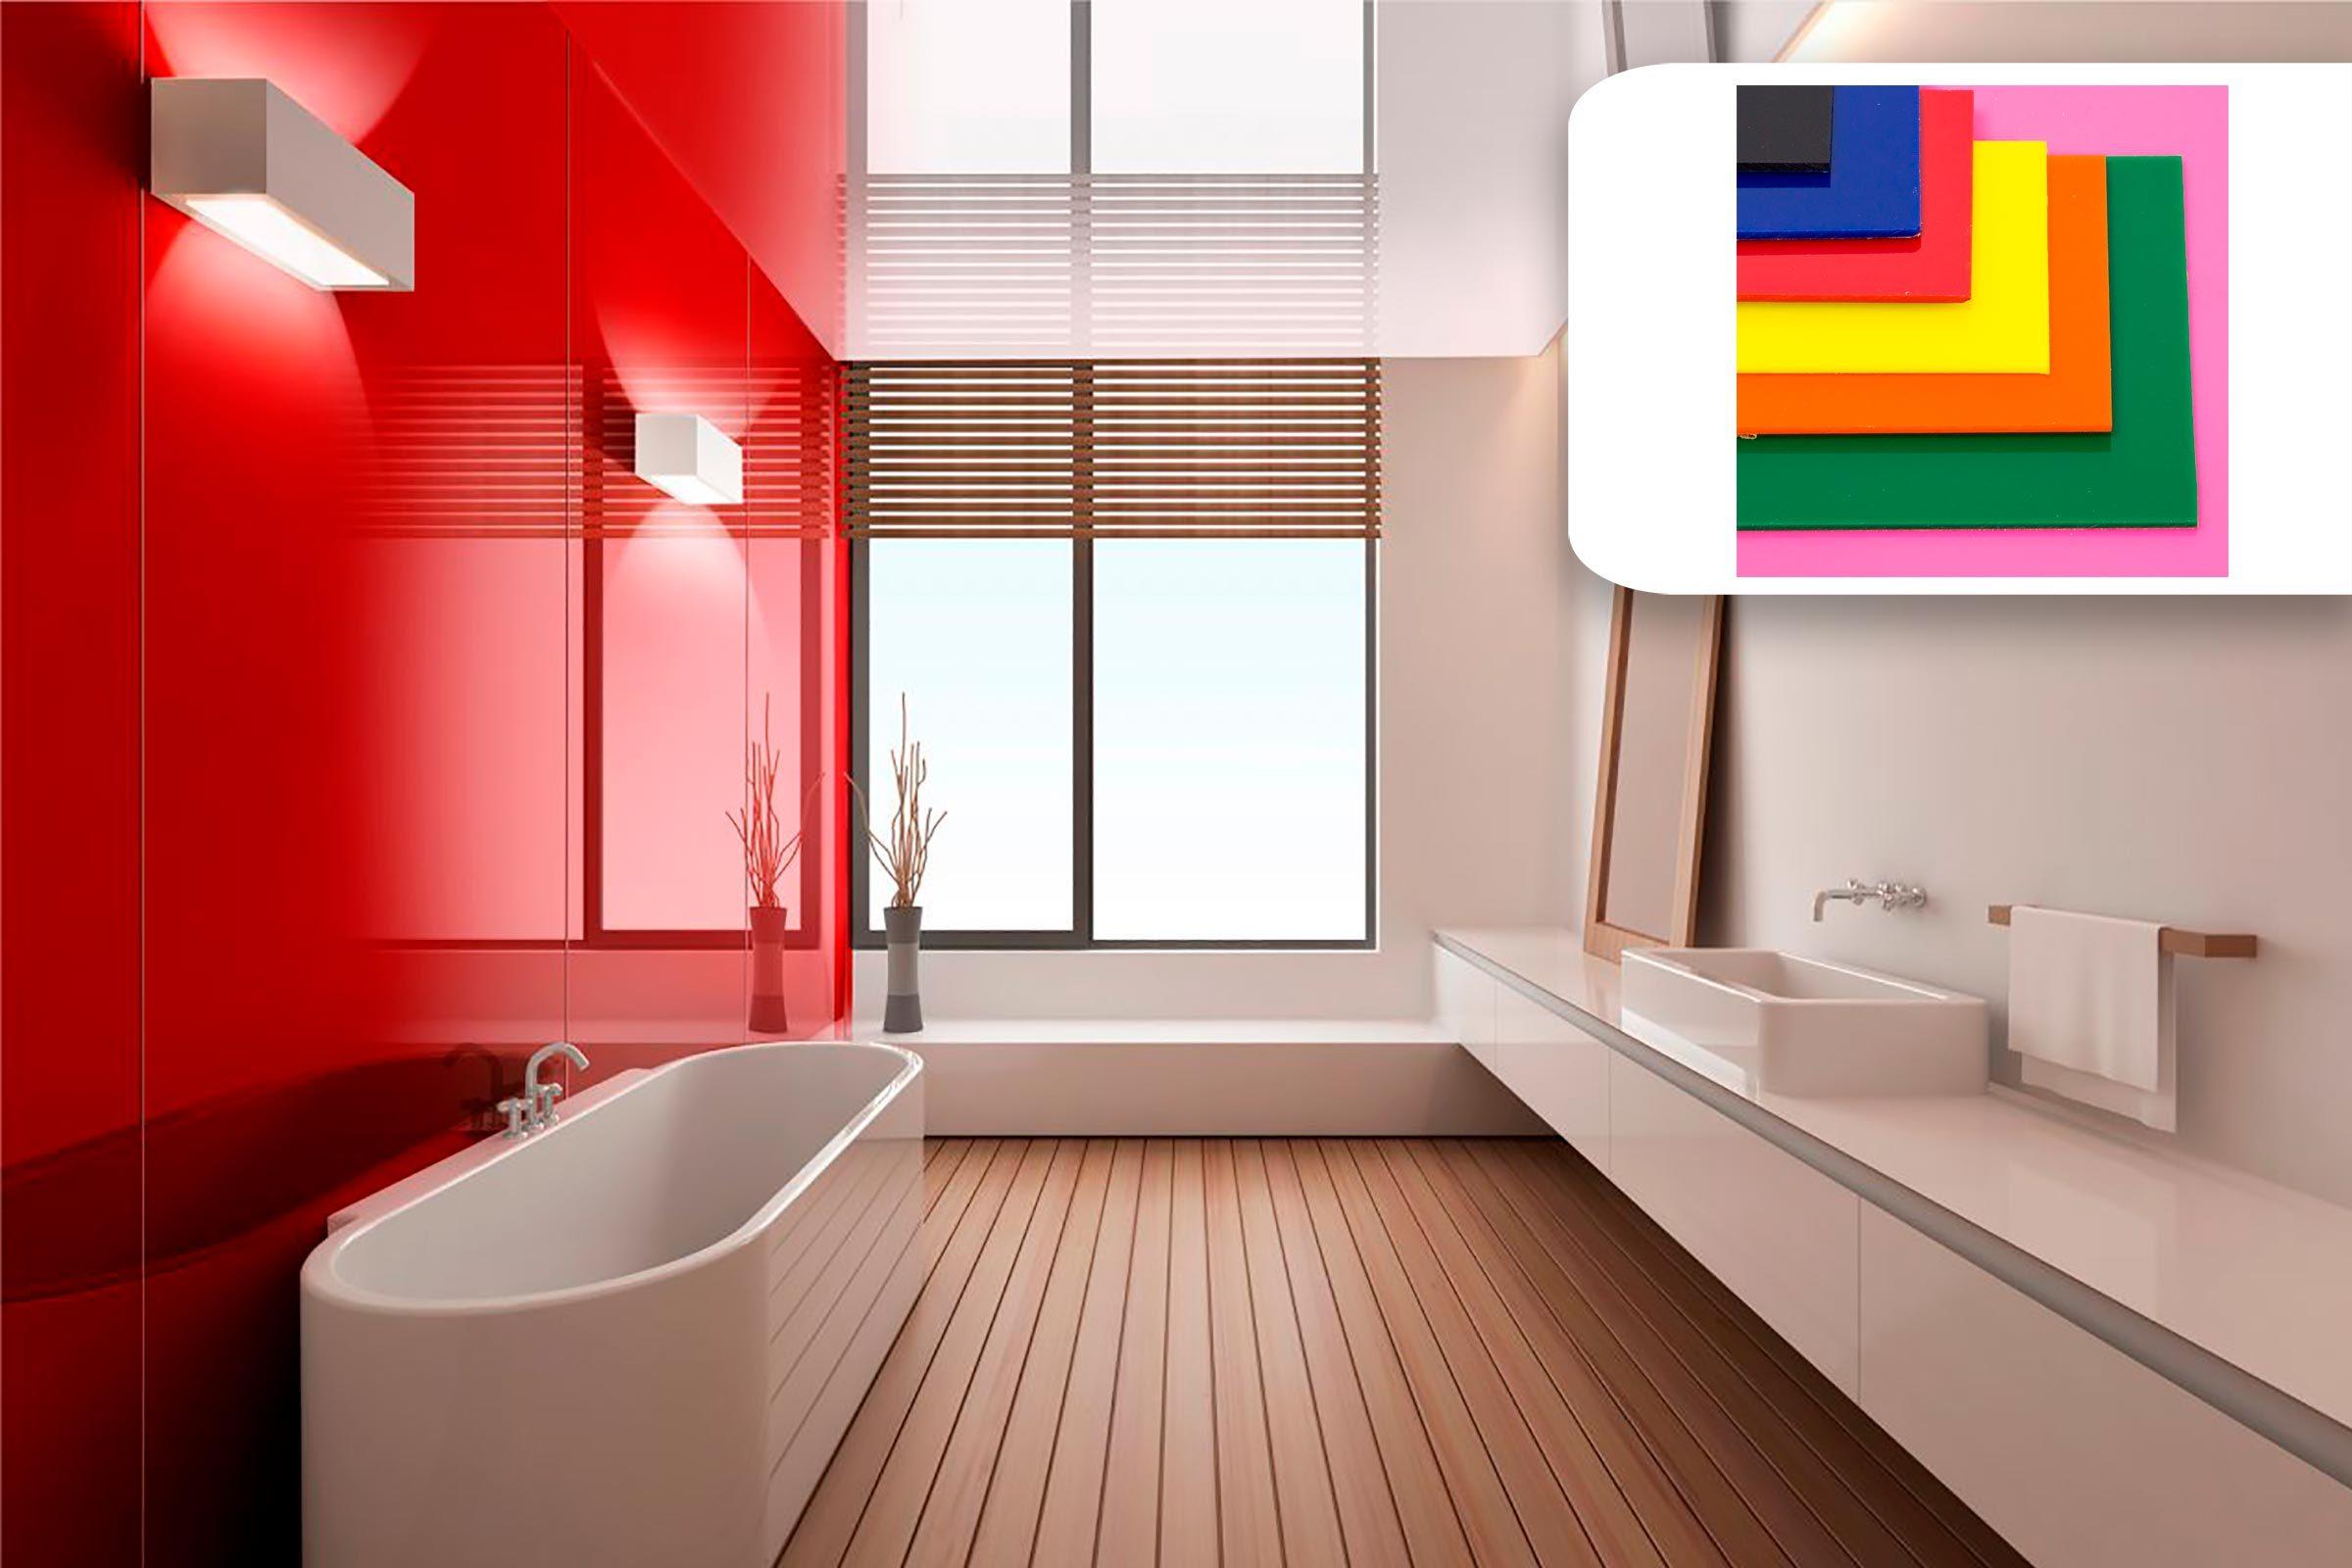 plexiglass bathroom accent